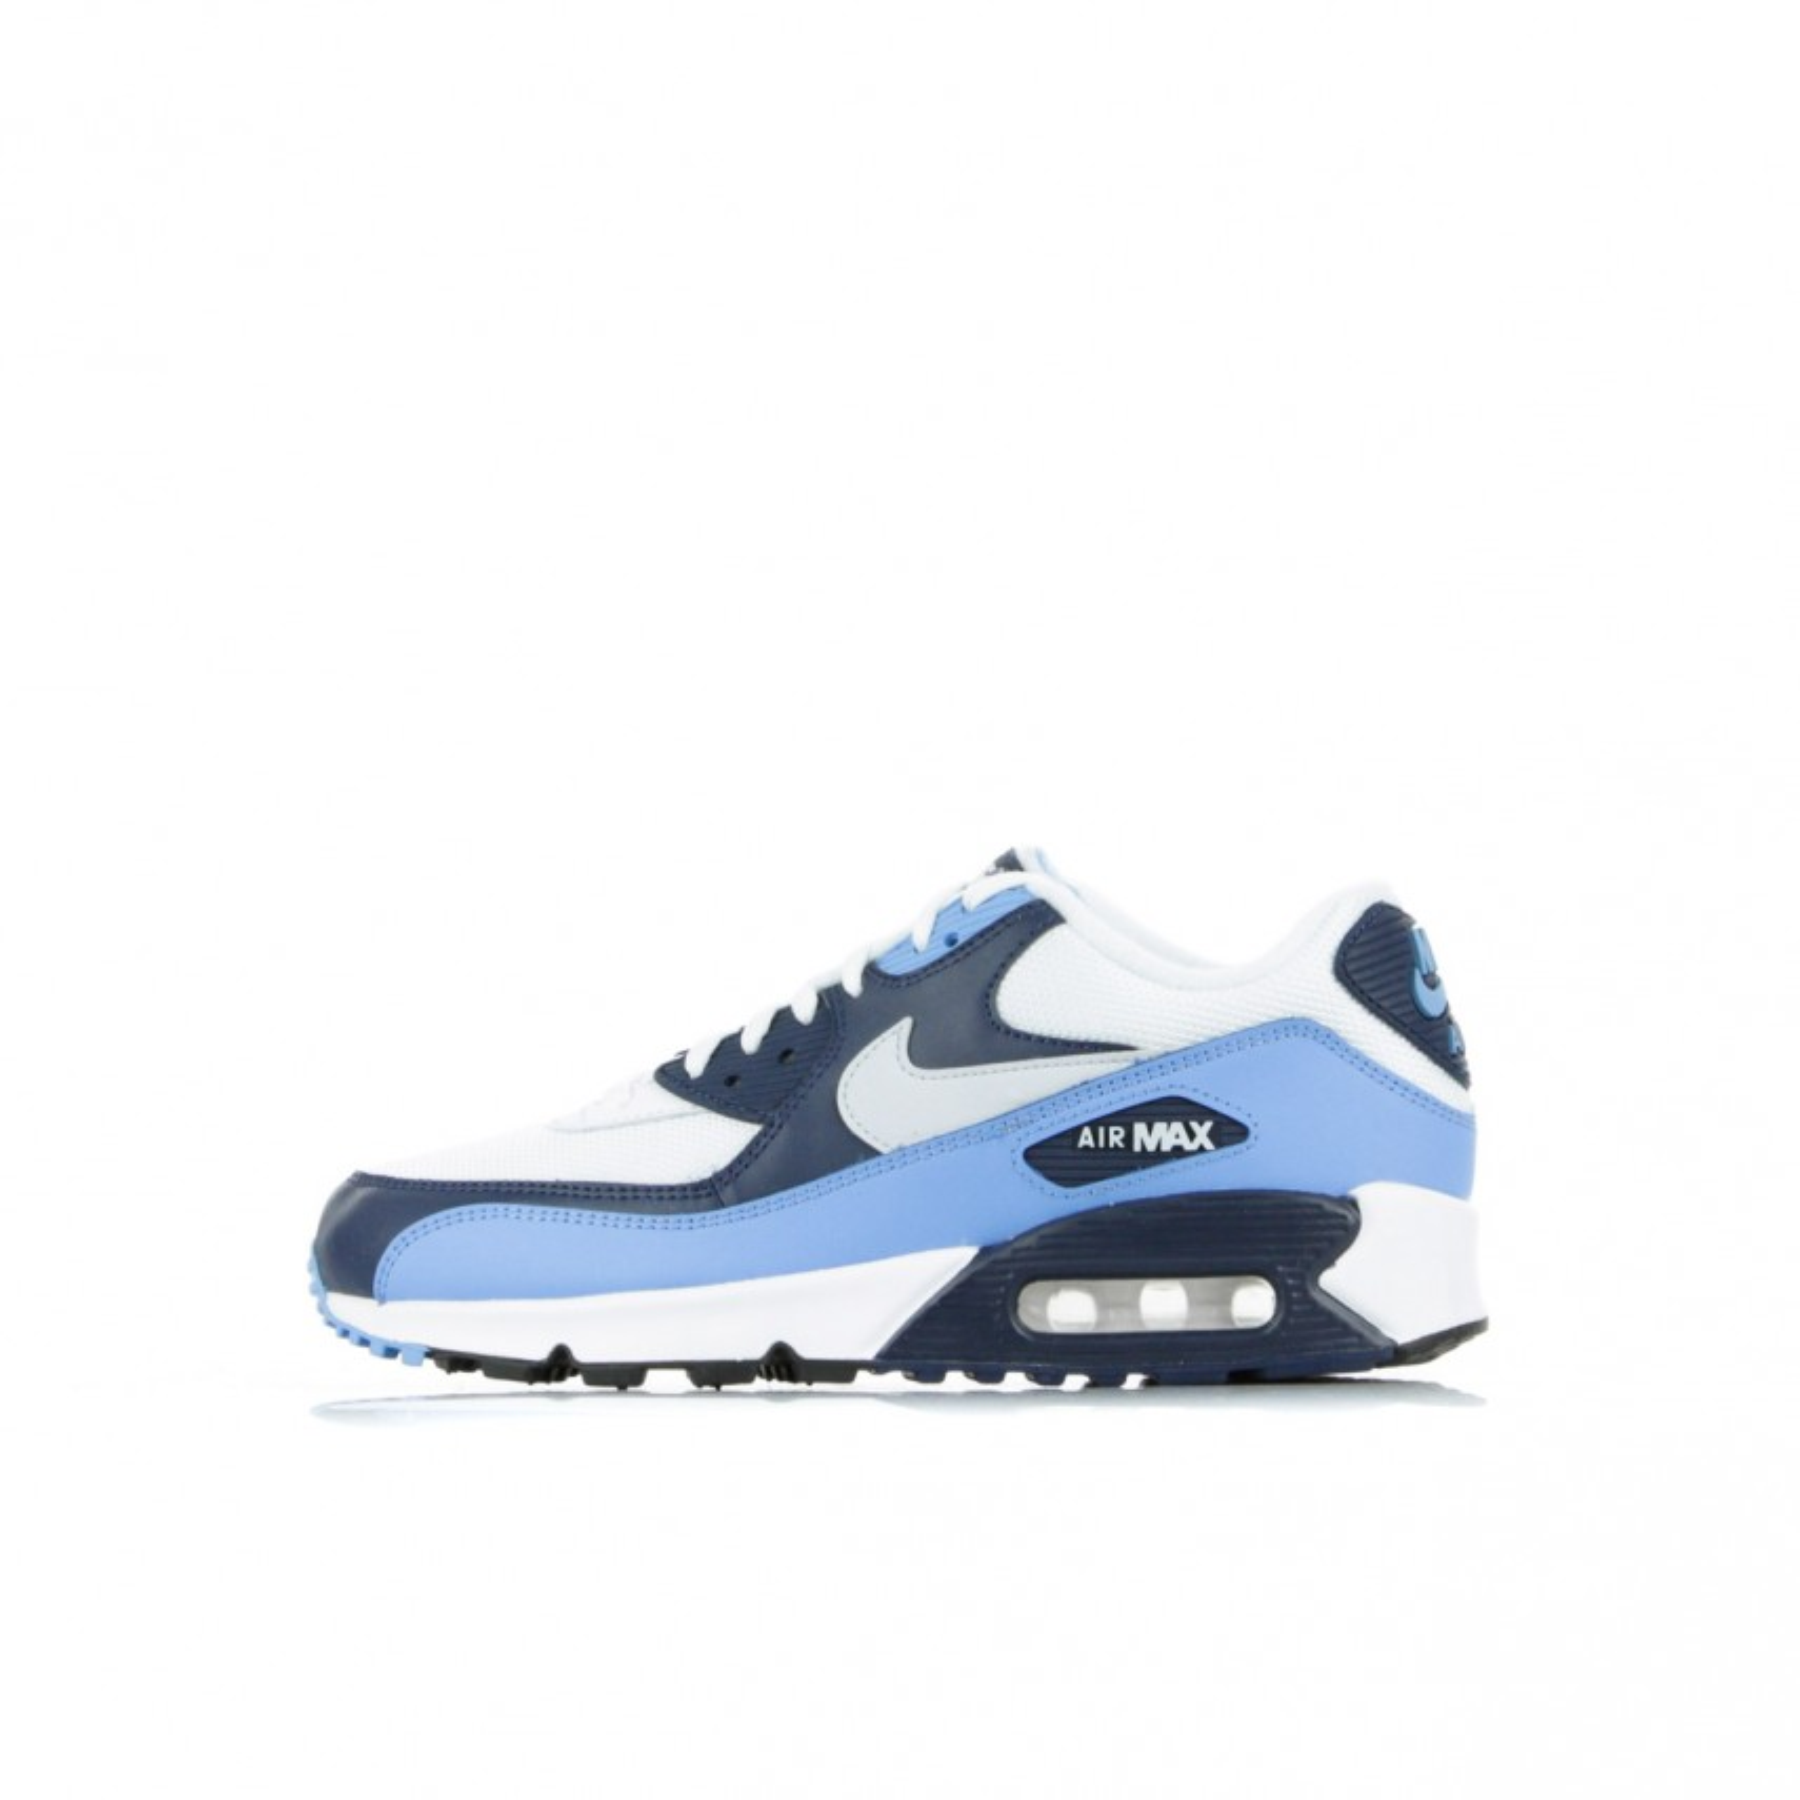 10 US Men Nike Air Max 90 Essential Pure Platinum AJ1285